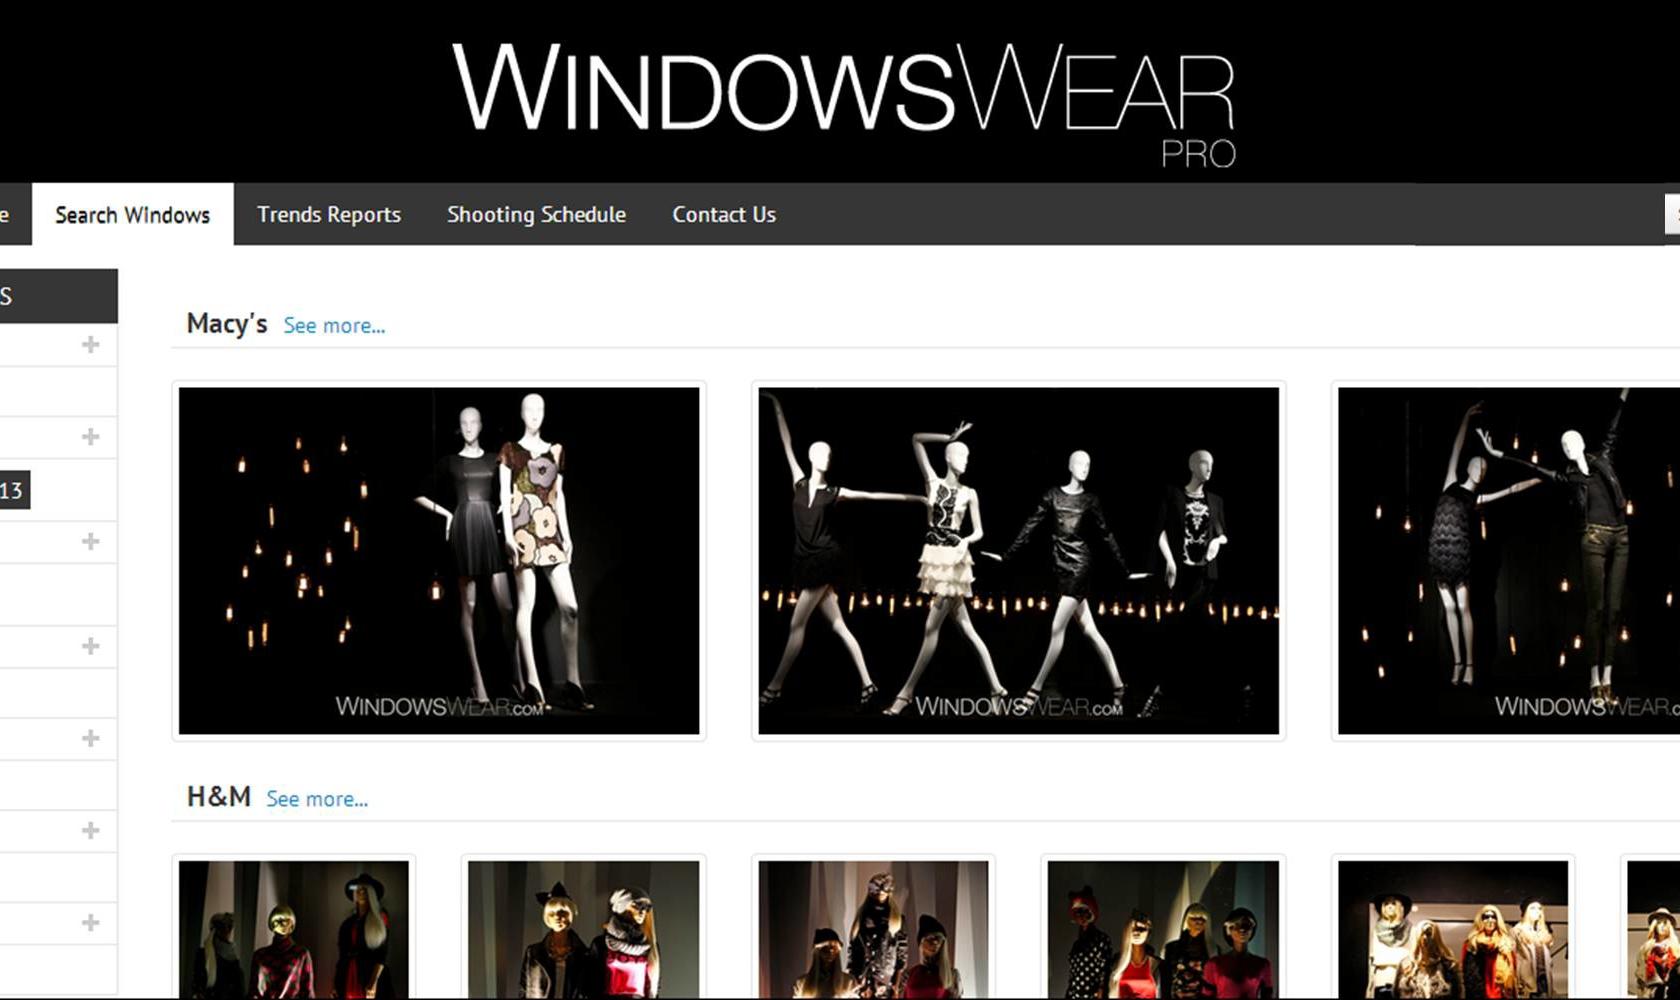 windowswear-pro_lamodecnous.com-la-mode-c-nous_livelamodecnous.com_live-la-mode-c-nous_lmcn_livelamodecnous